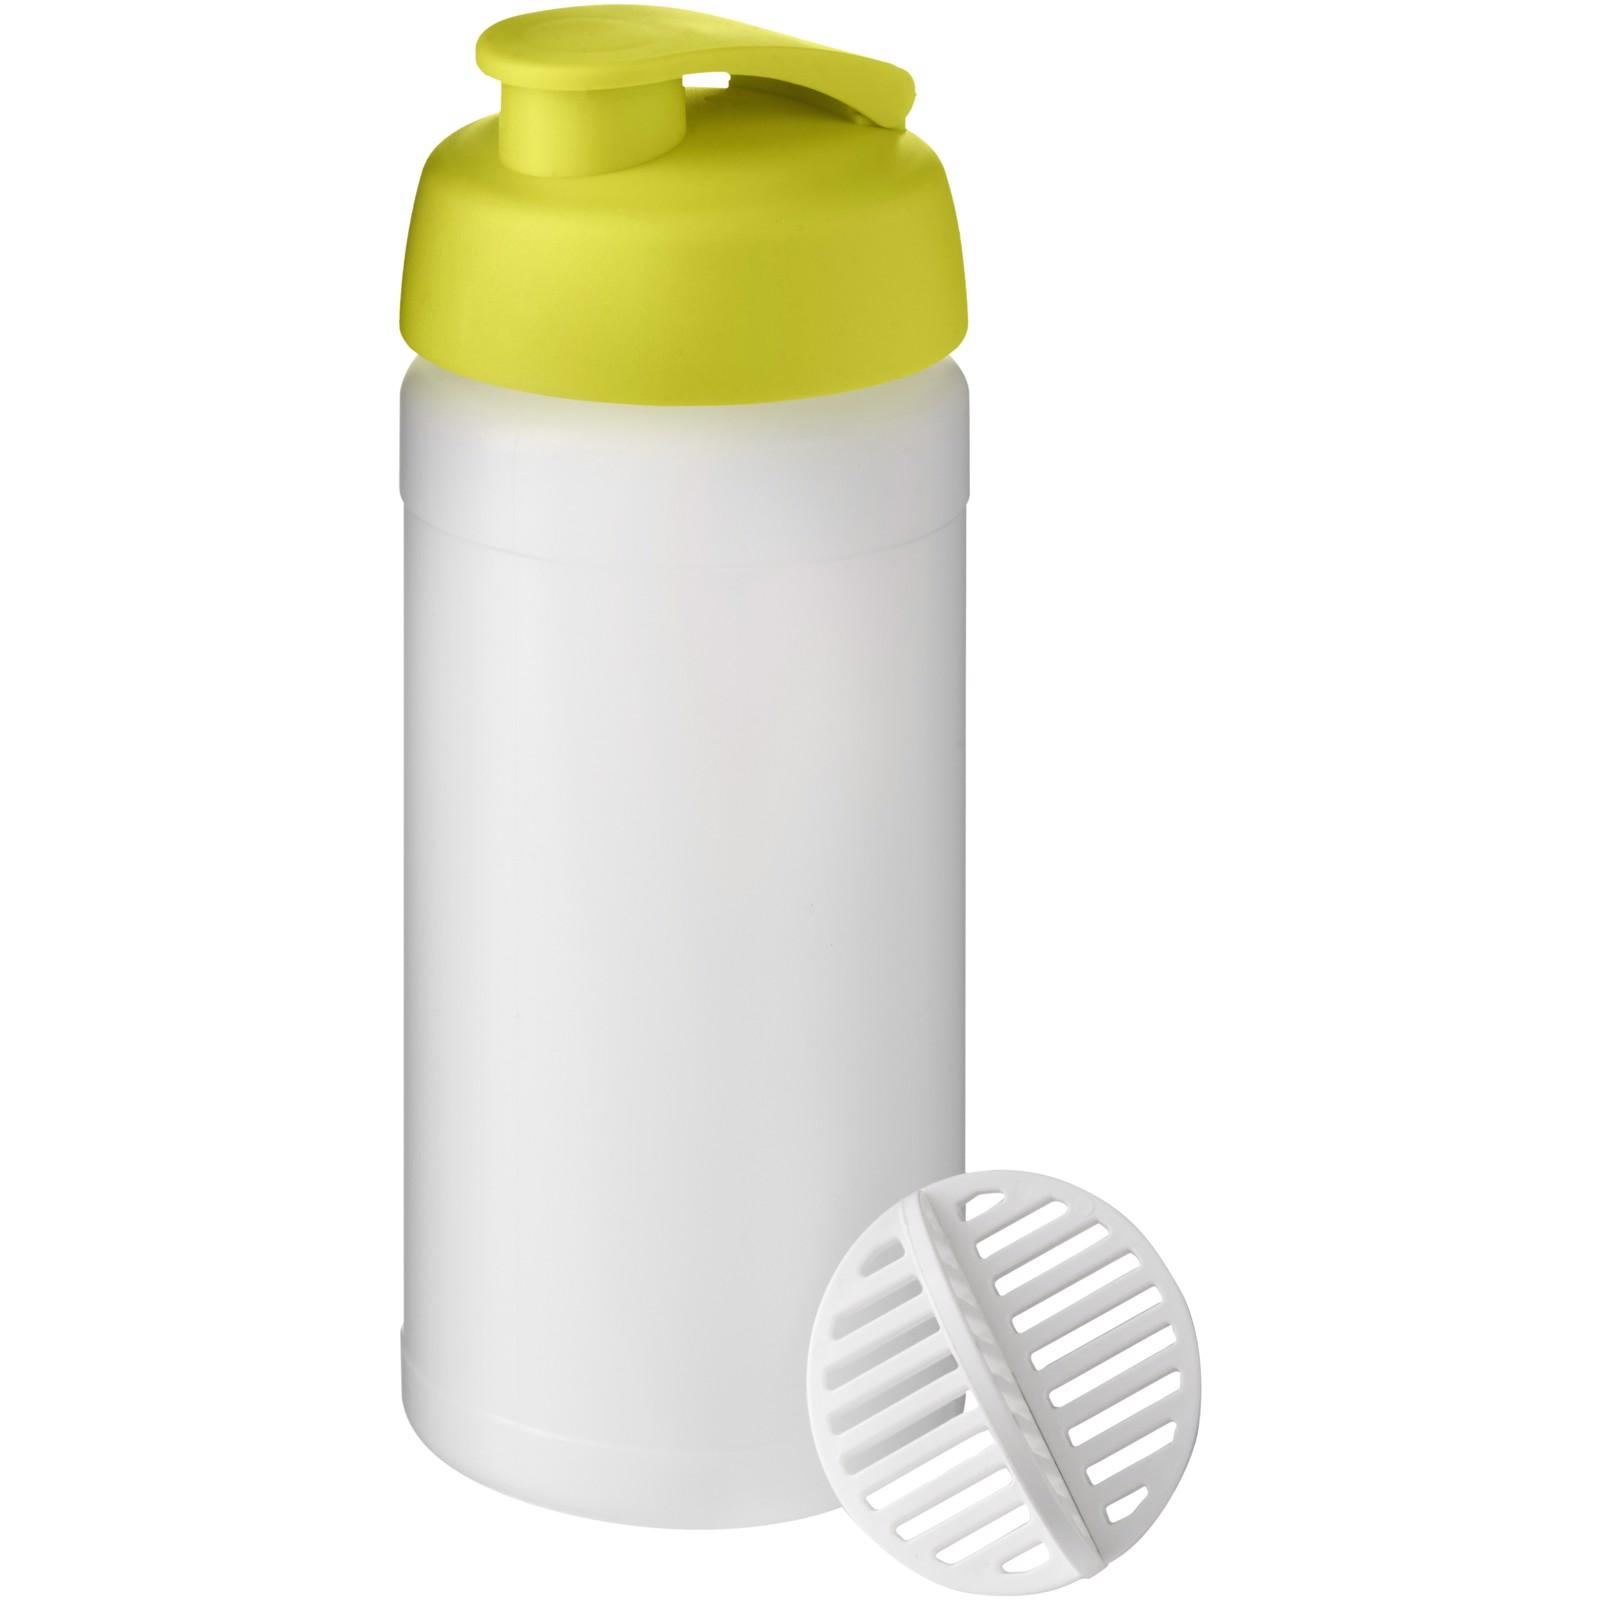 Baseline Plus 500 ml shaker bottle - Lime / Frosted clear